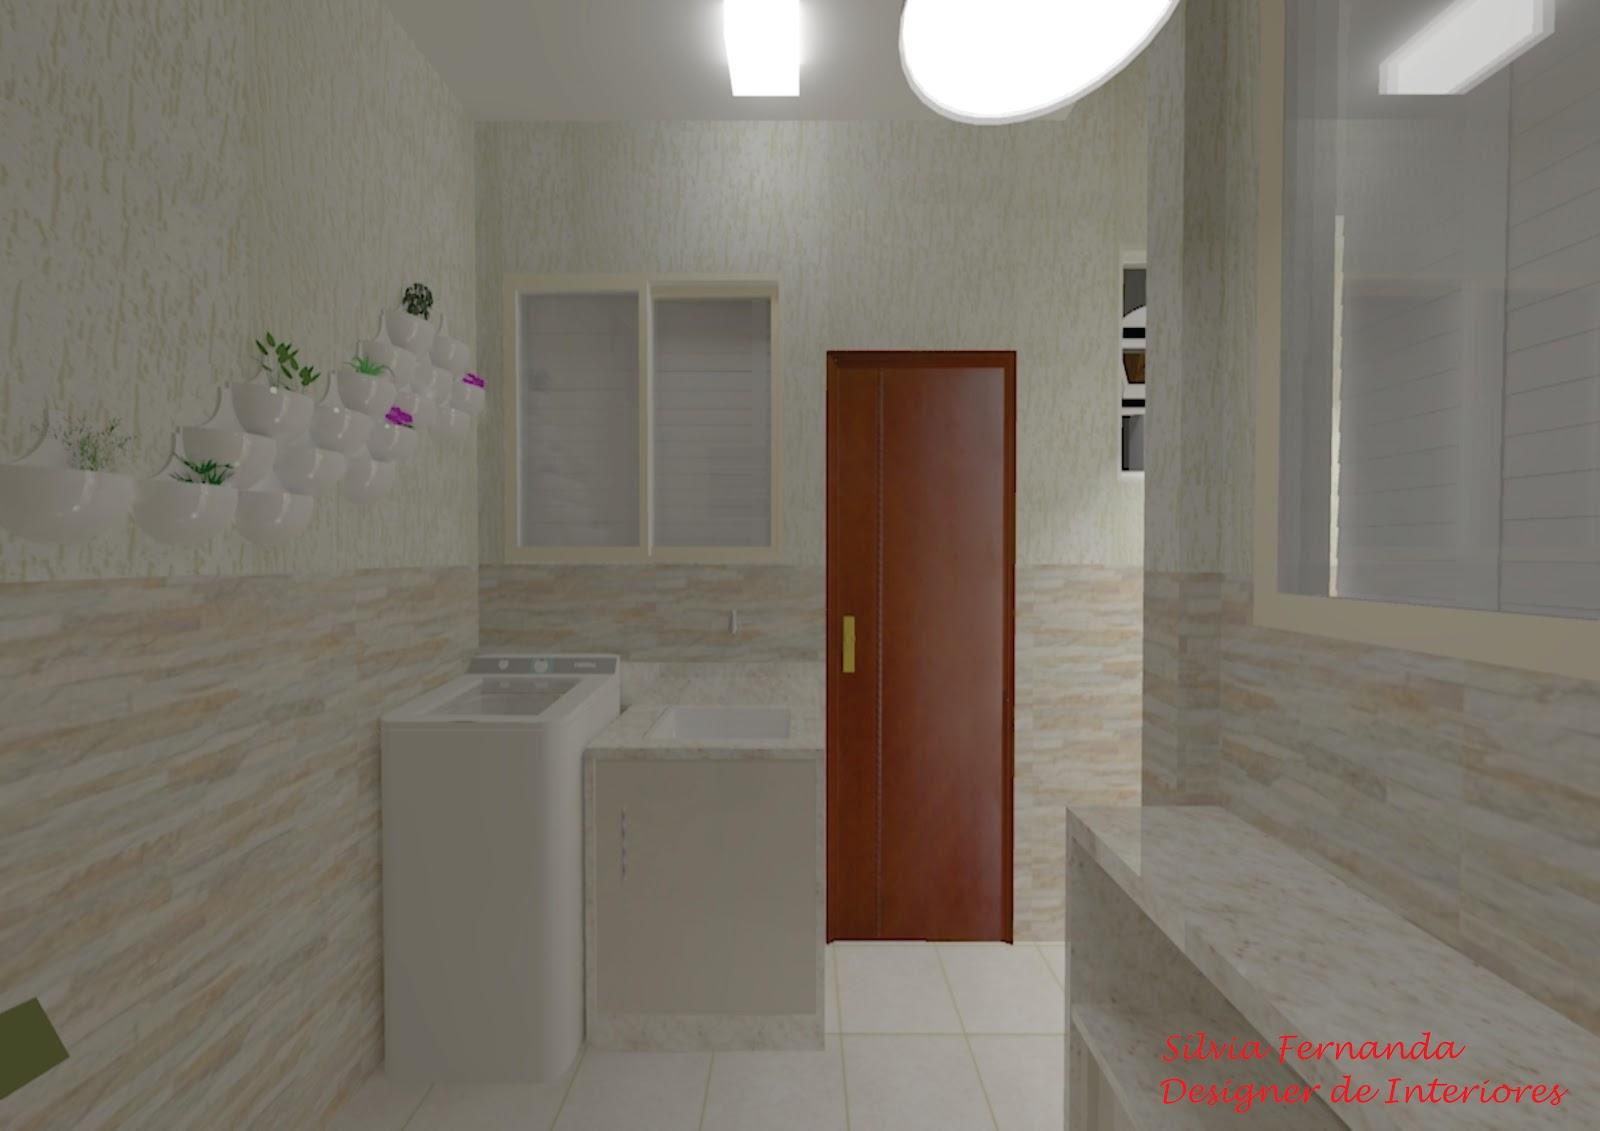 Criar Interiores : Banheiro azul e branco #4C2813 1600x1131 Bancada Banheiro Azul